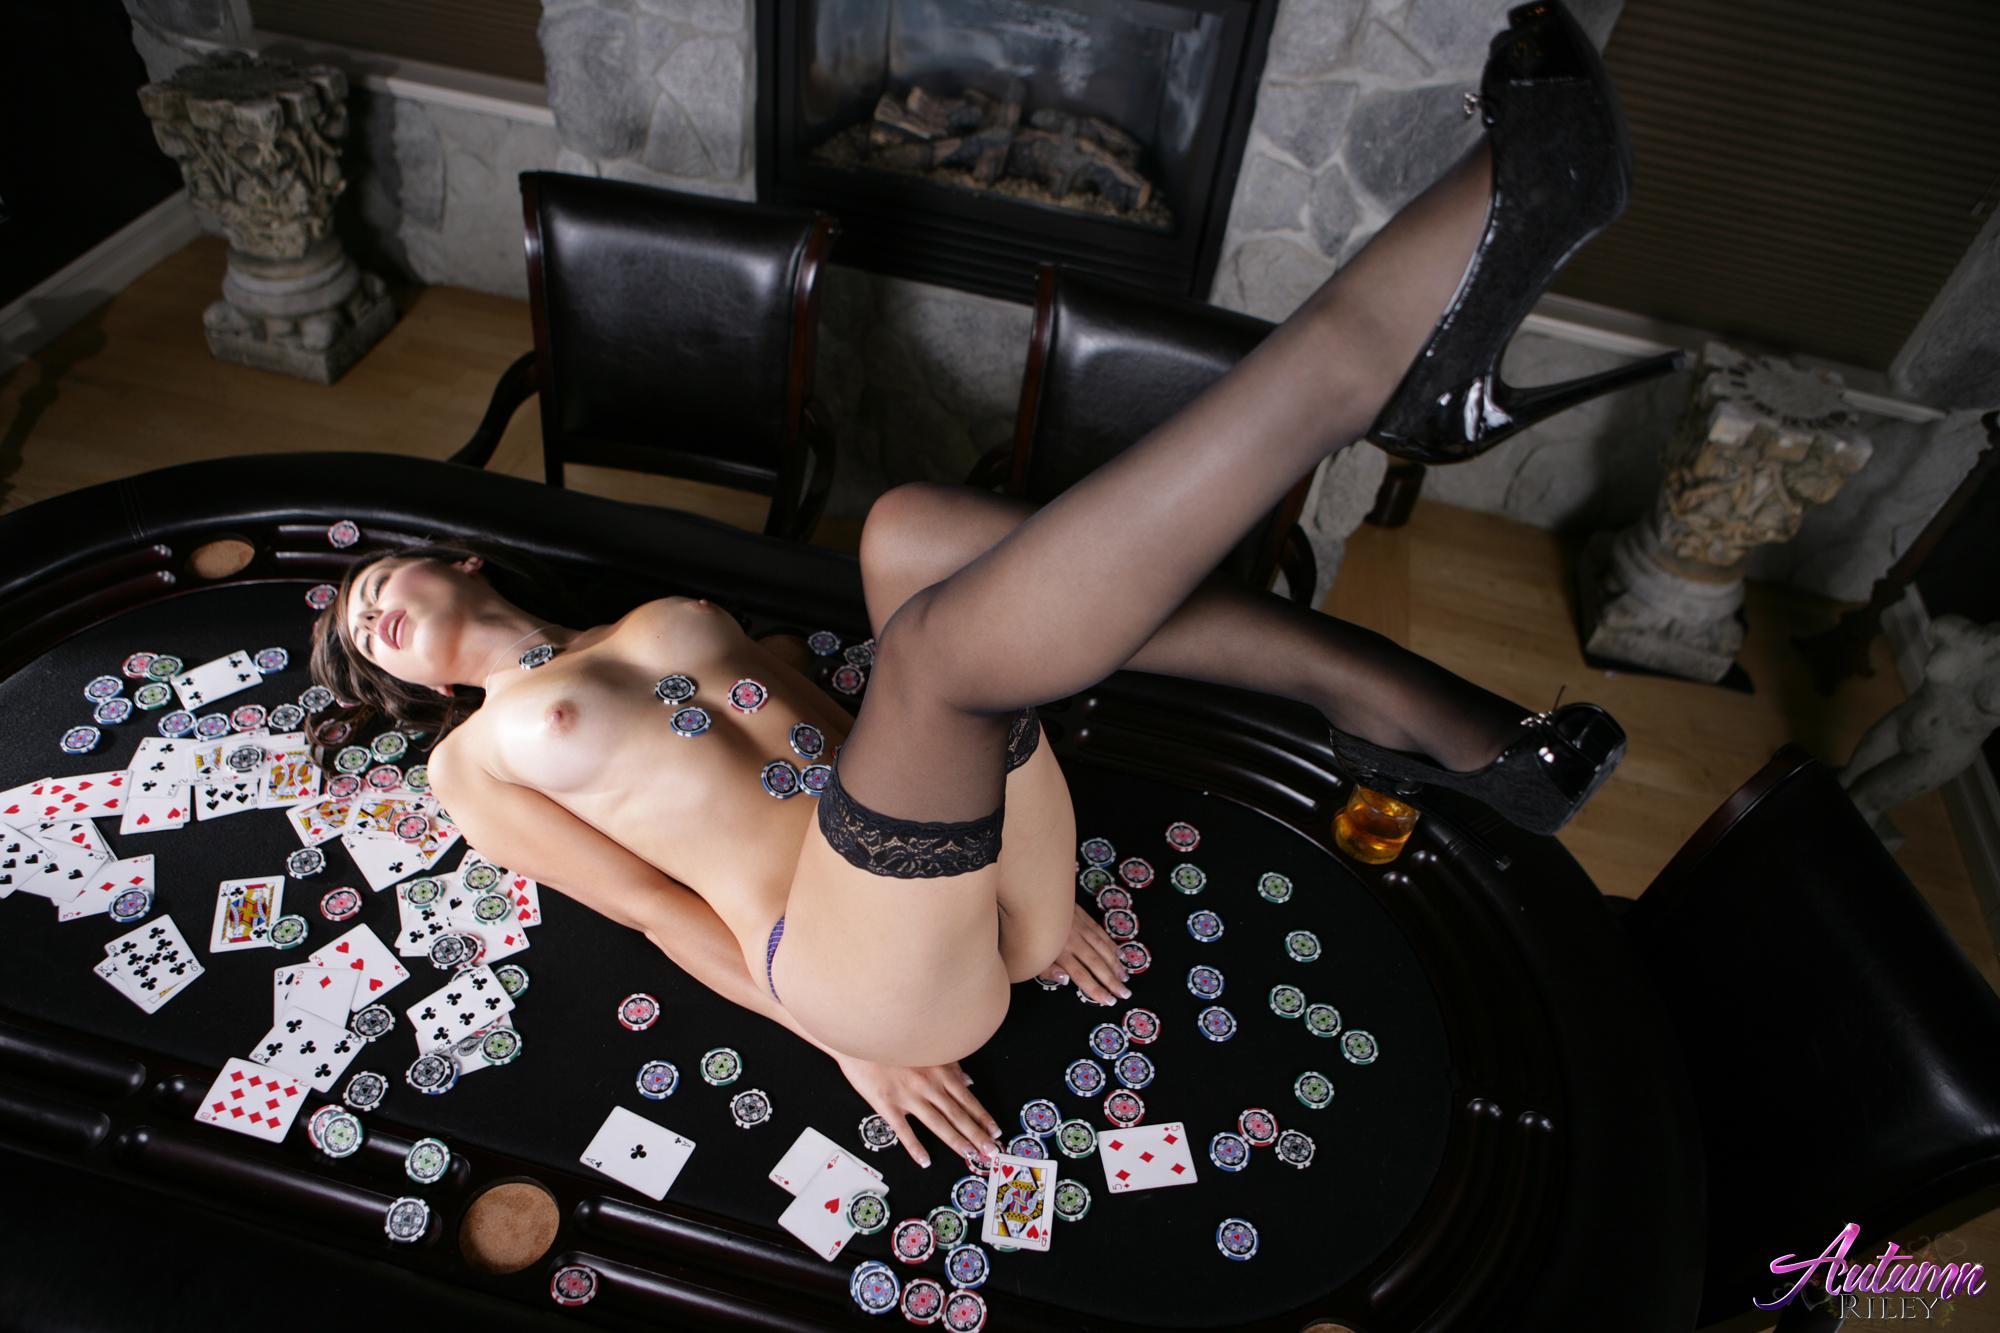 Nude poker girls